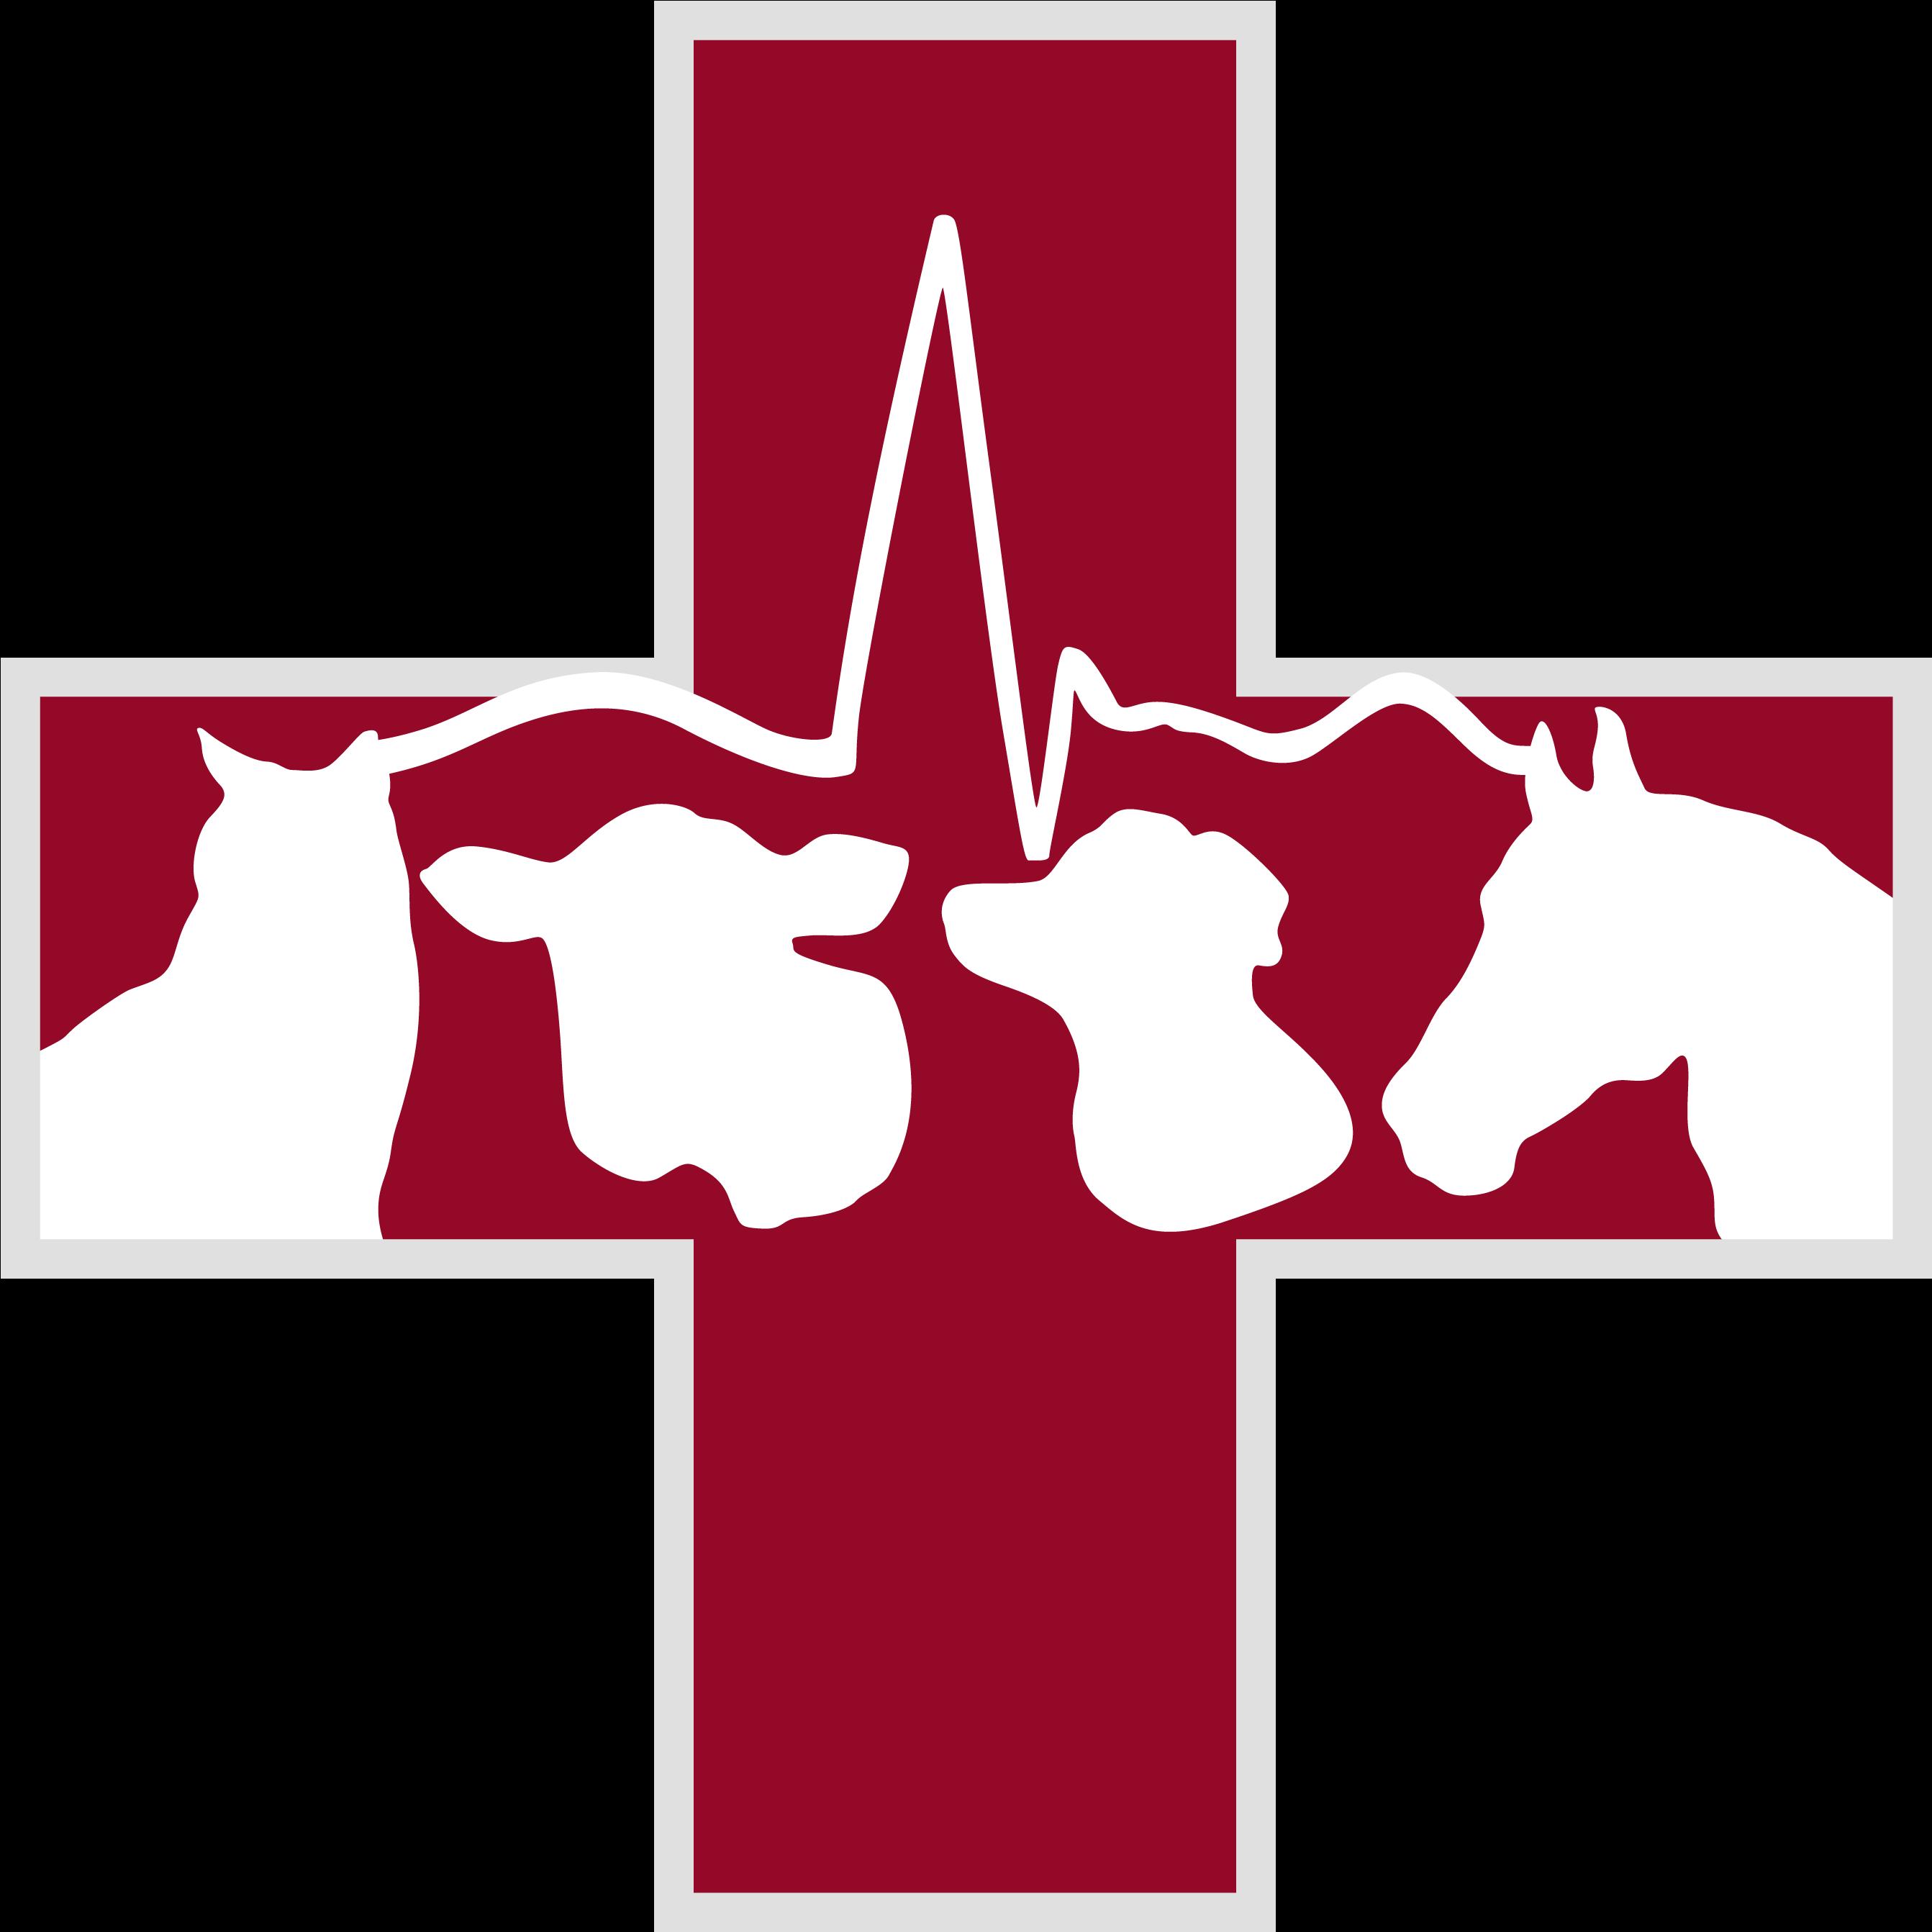 Png Free Stock Pemberton Veterinary Hospital Mixed.